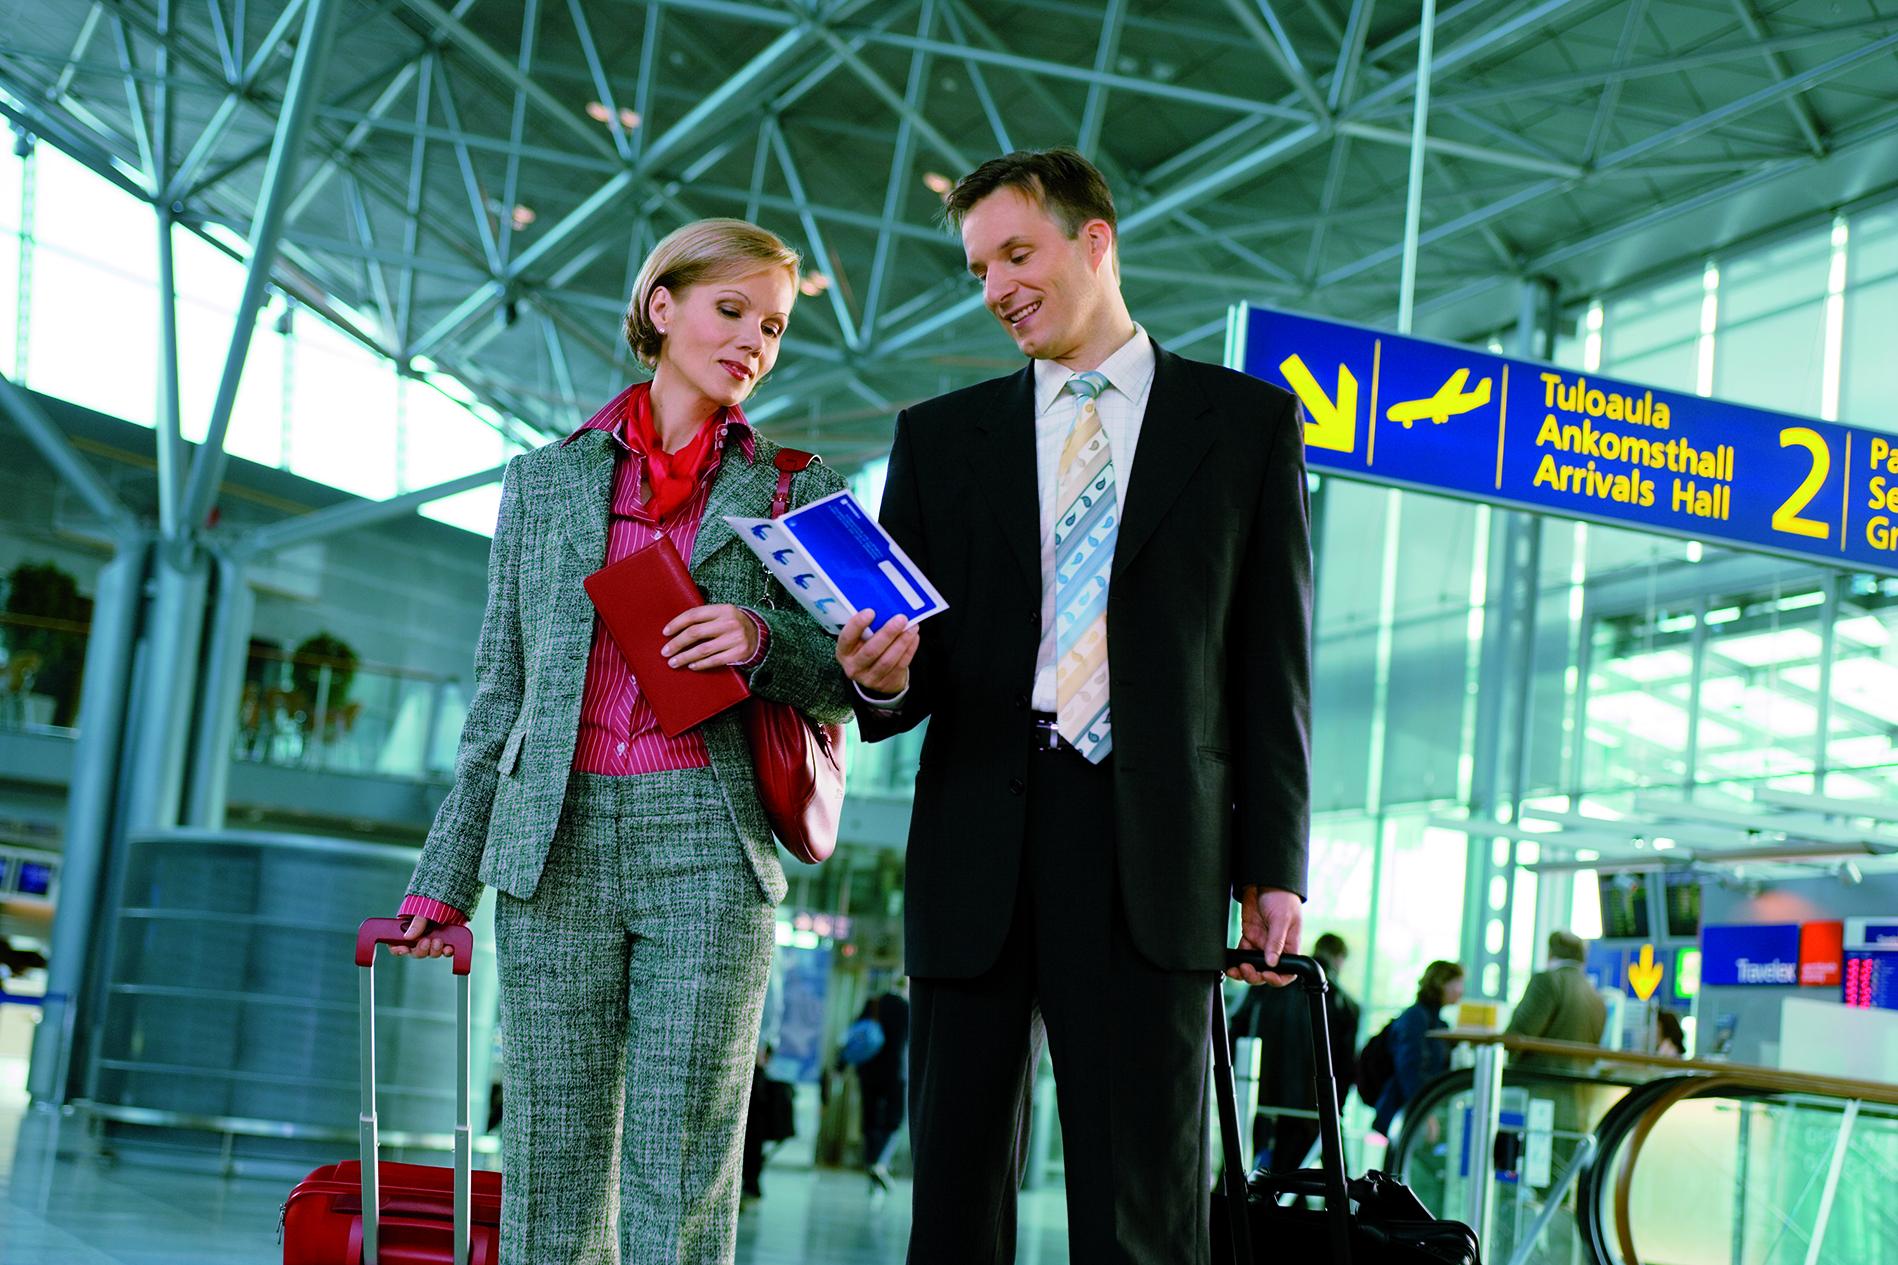 Airport_DepartureHall_125_4finavia_web.jpg